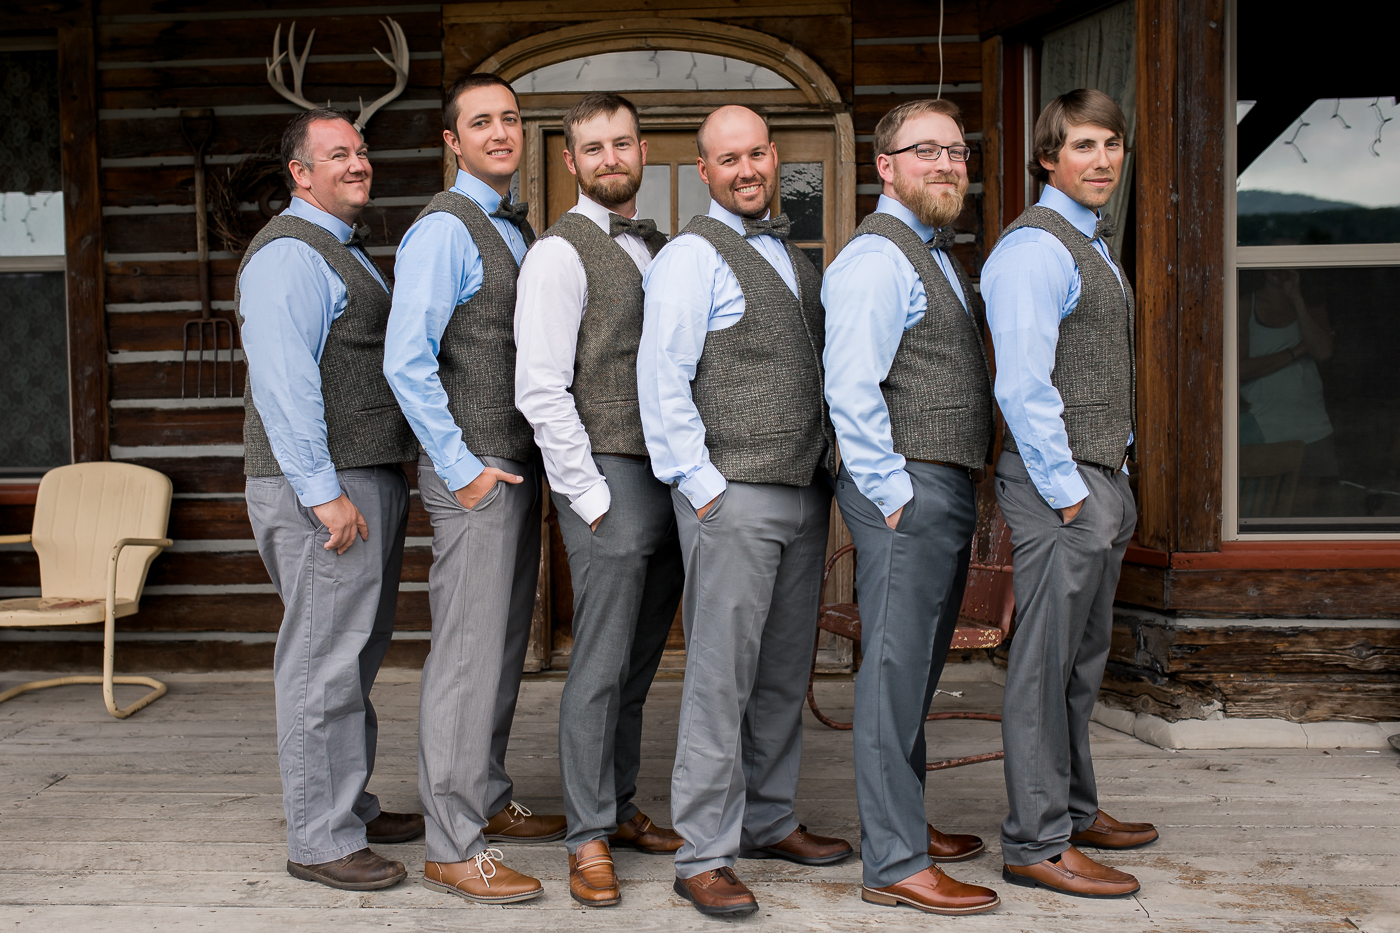 Groomsmen Wedding day portaits